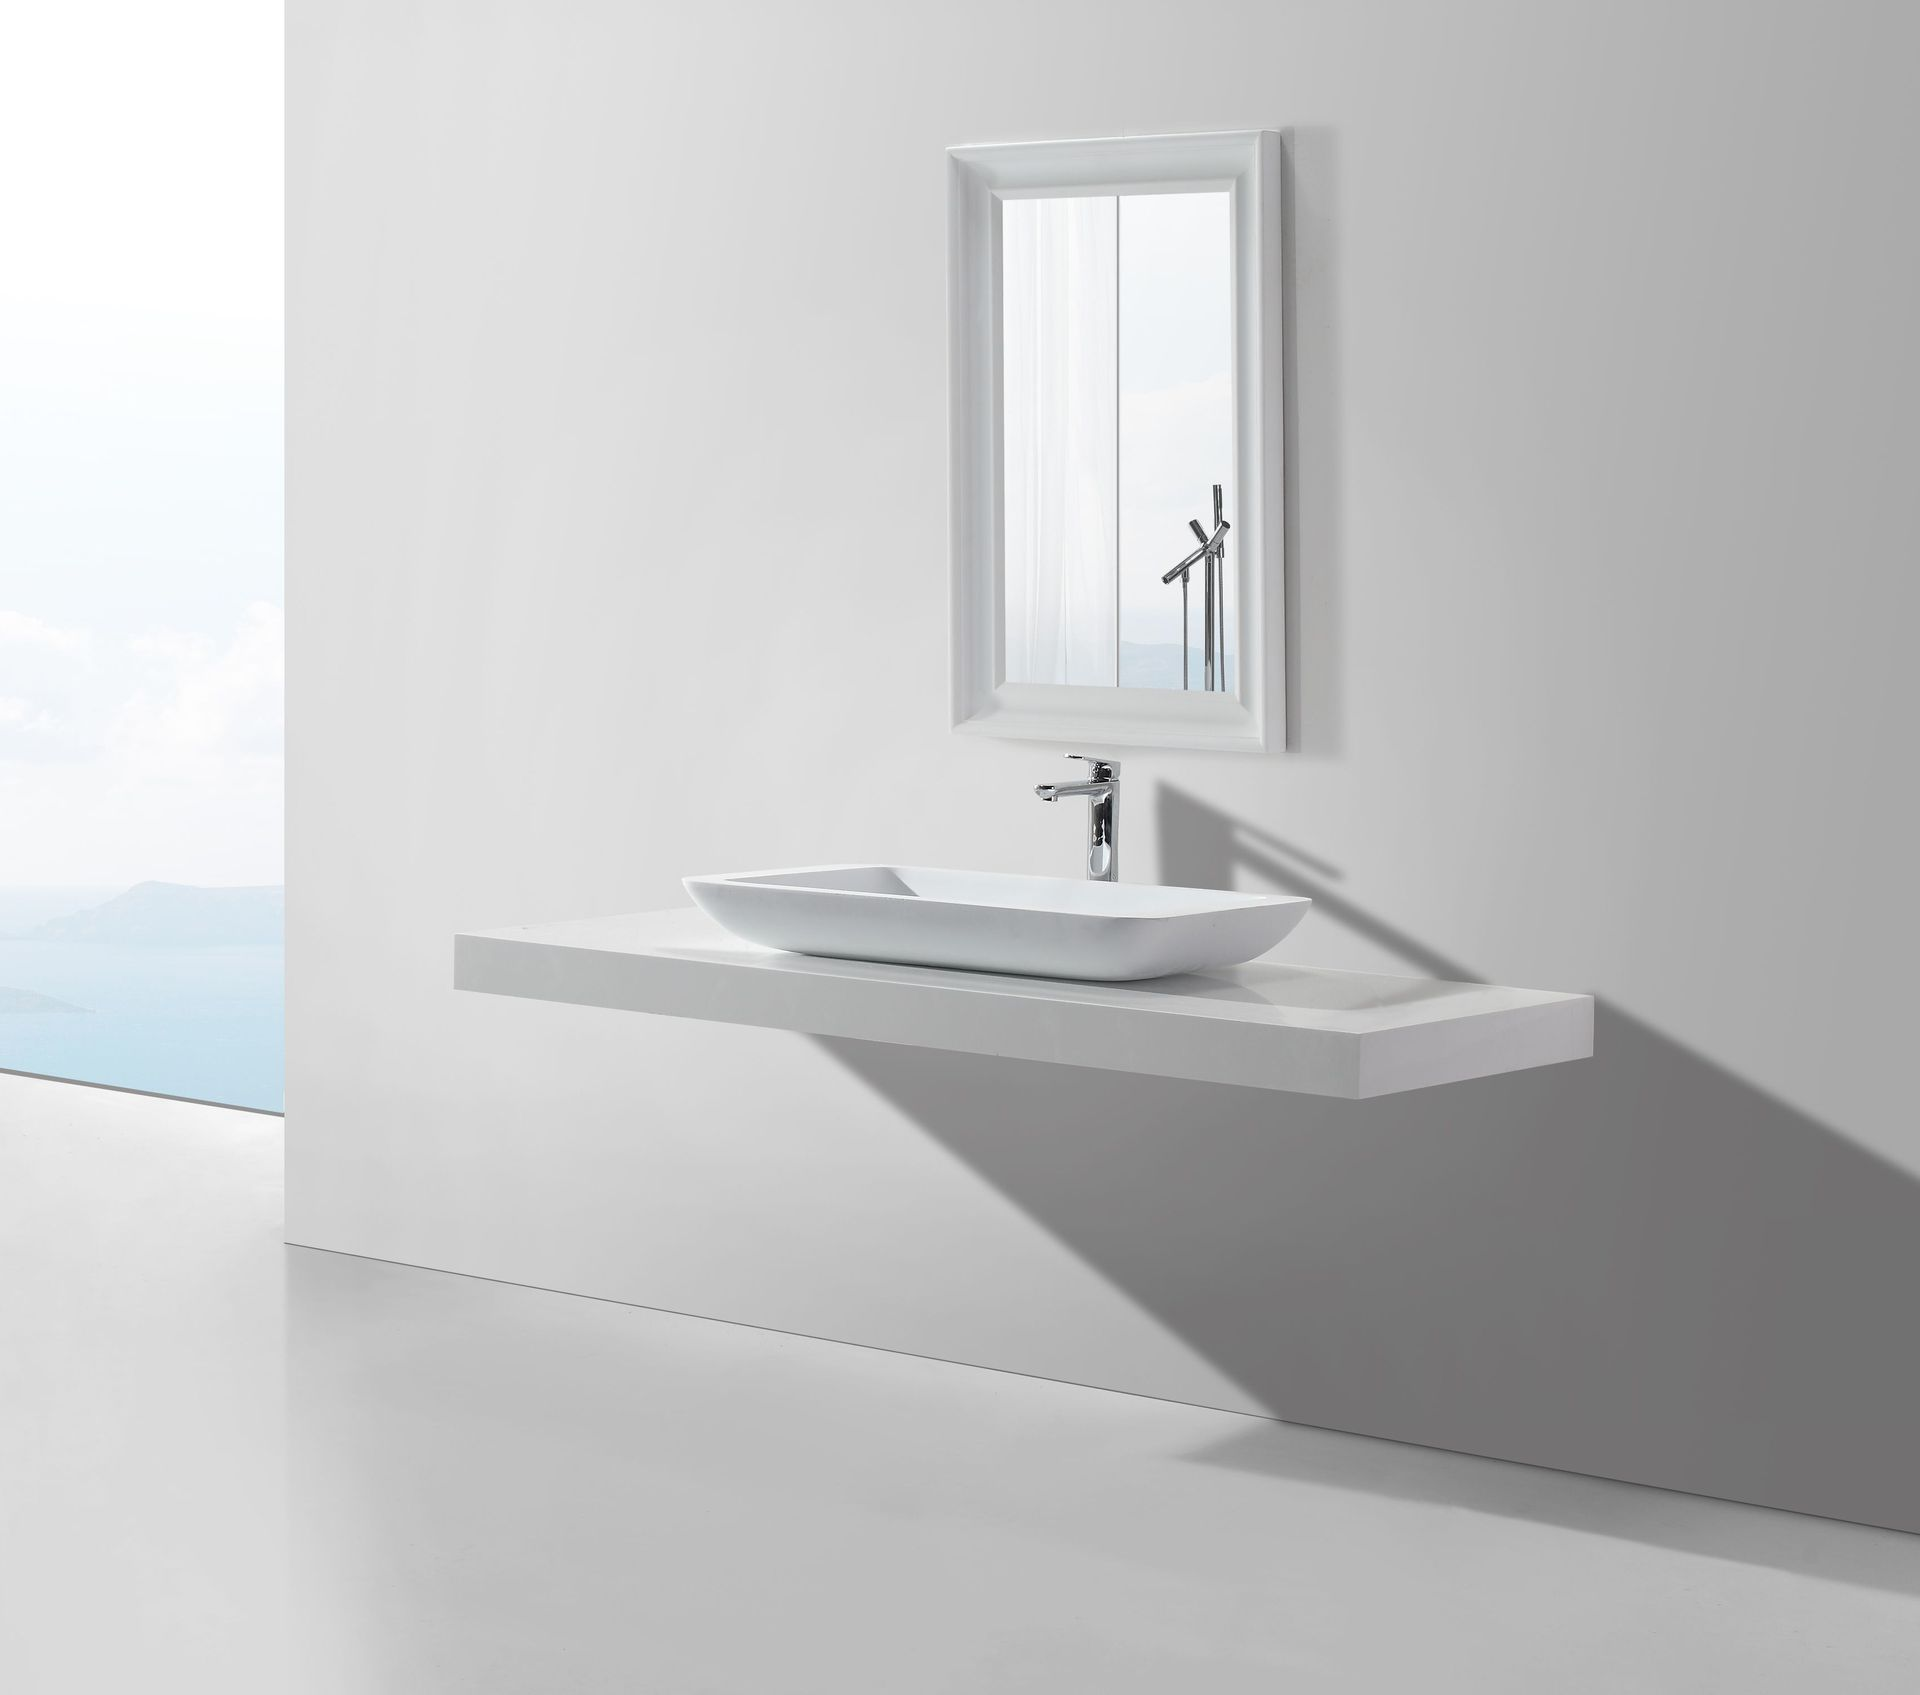 mineralguss aufsatzwaschtisch maw2324 duschdeals. Black Bedroom Furniture Sets. Home Design Ideas